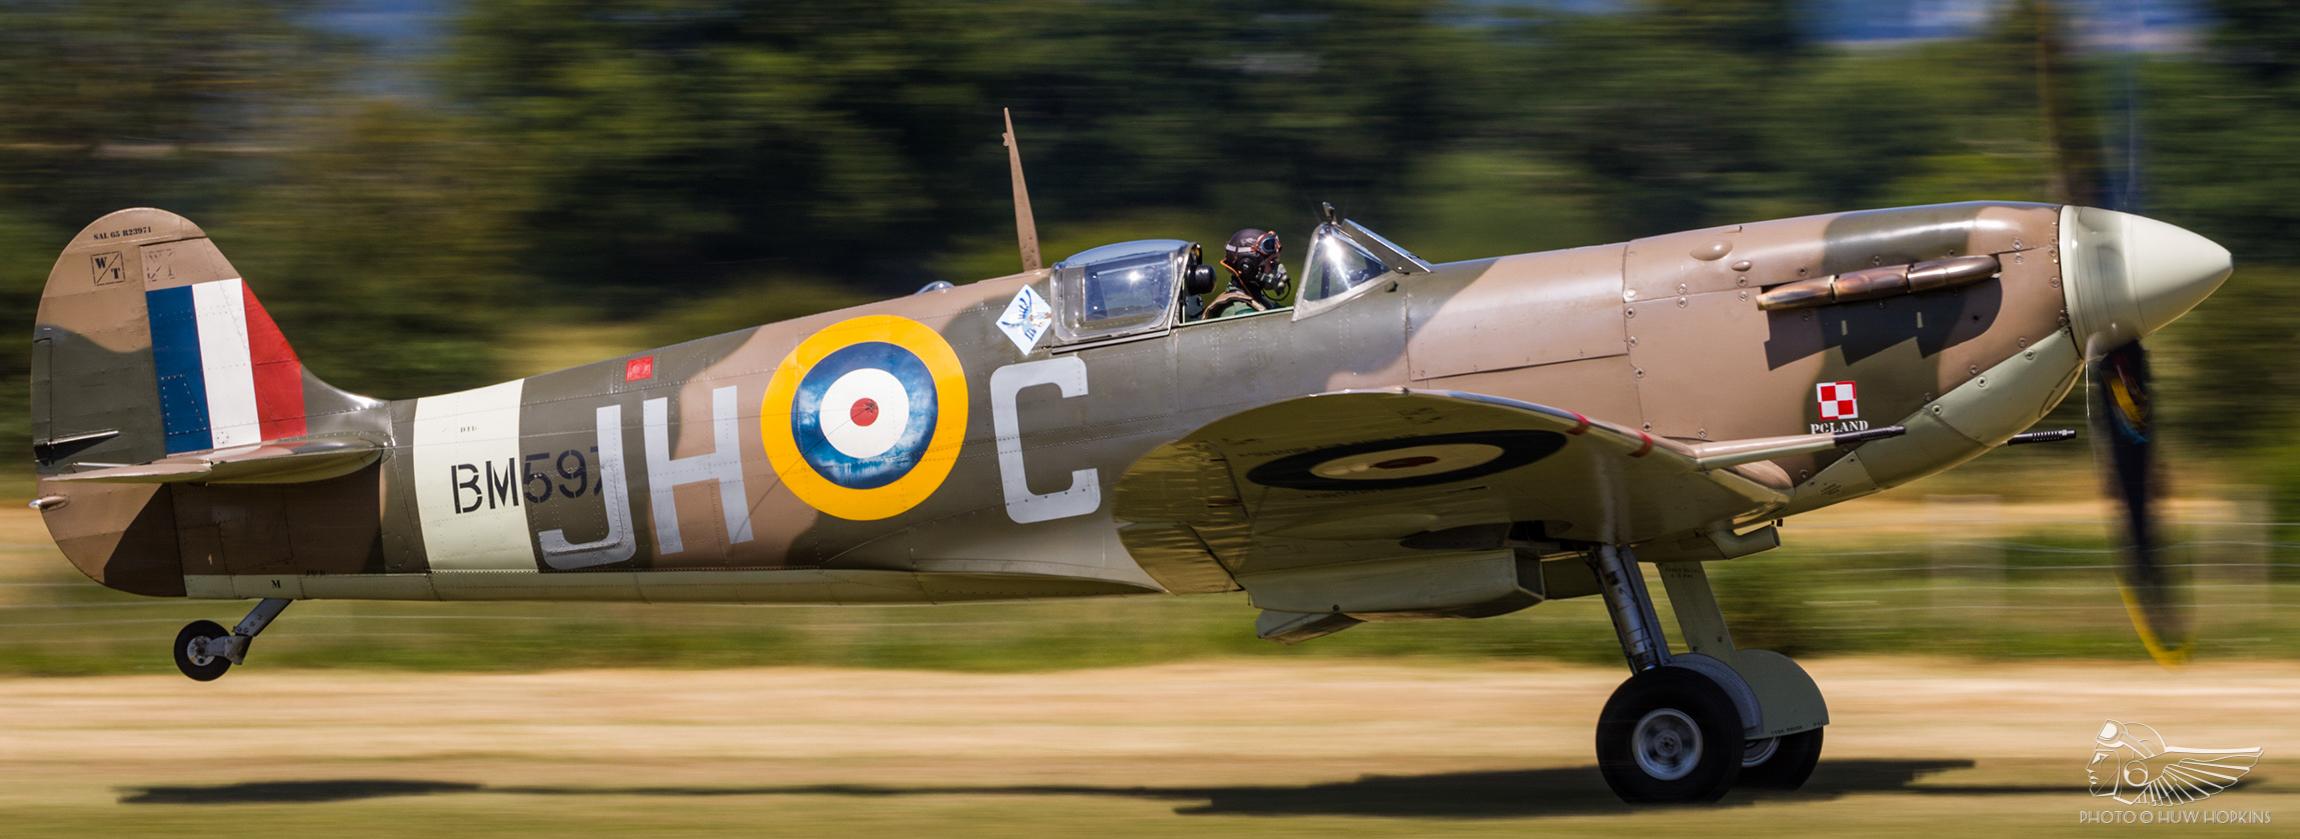 Aero Legends' Battle of Britain Airshow draws classics and warbirds to Headcorn